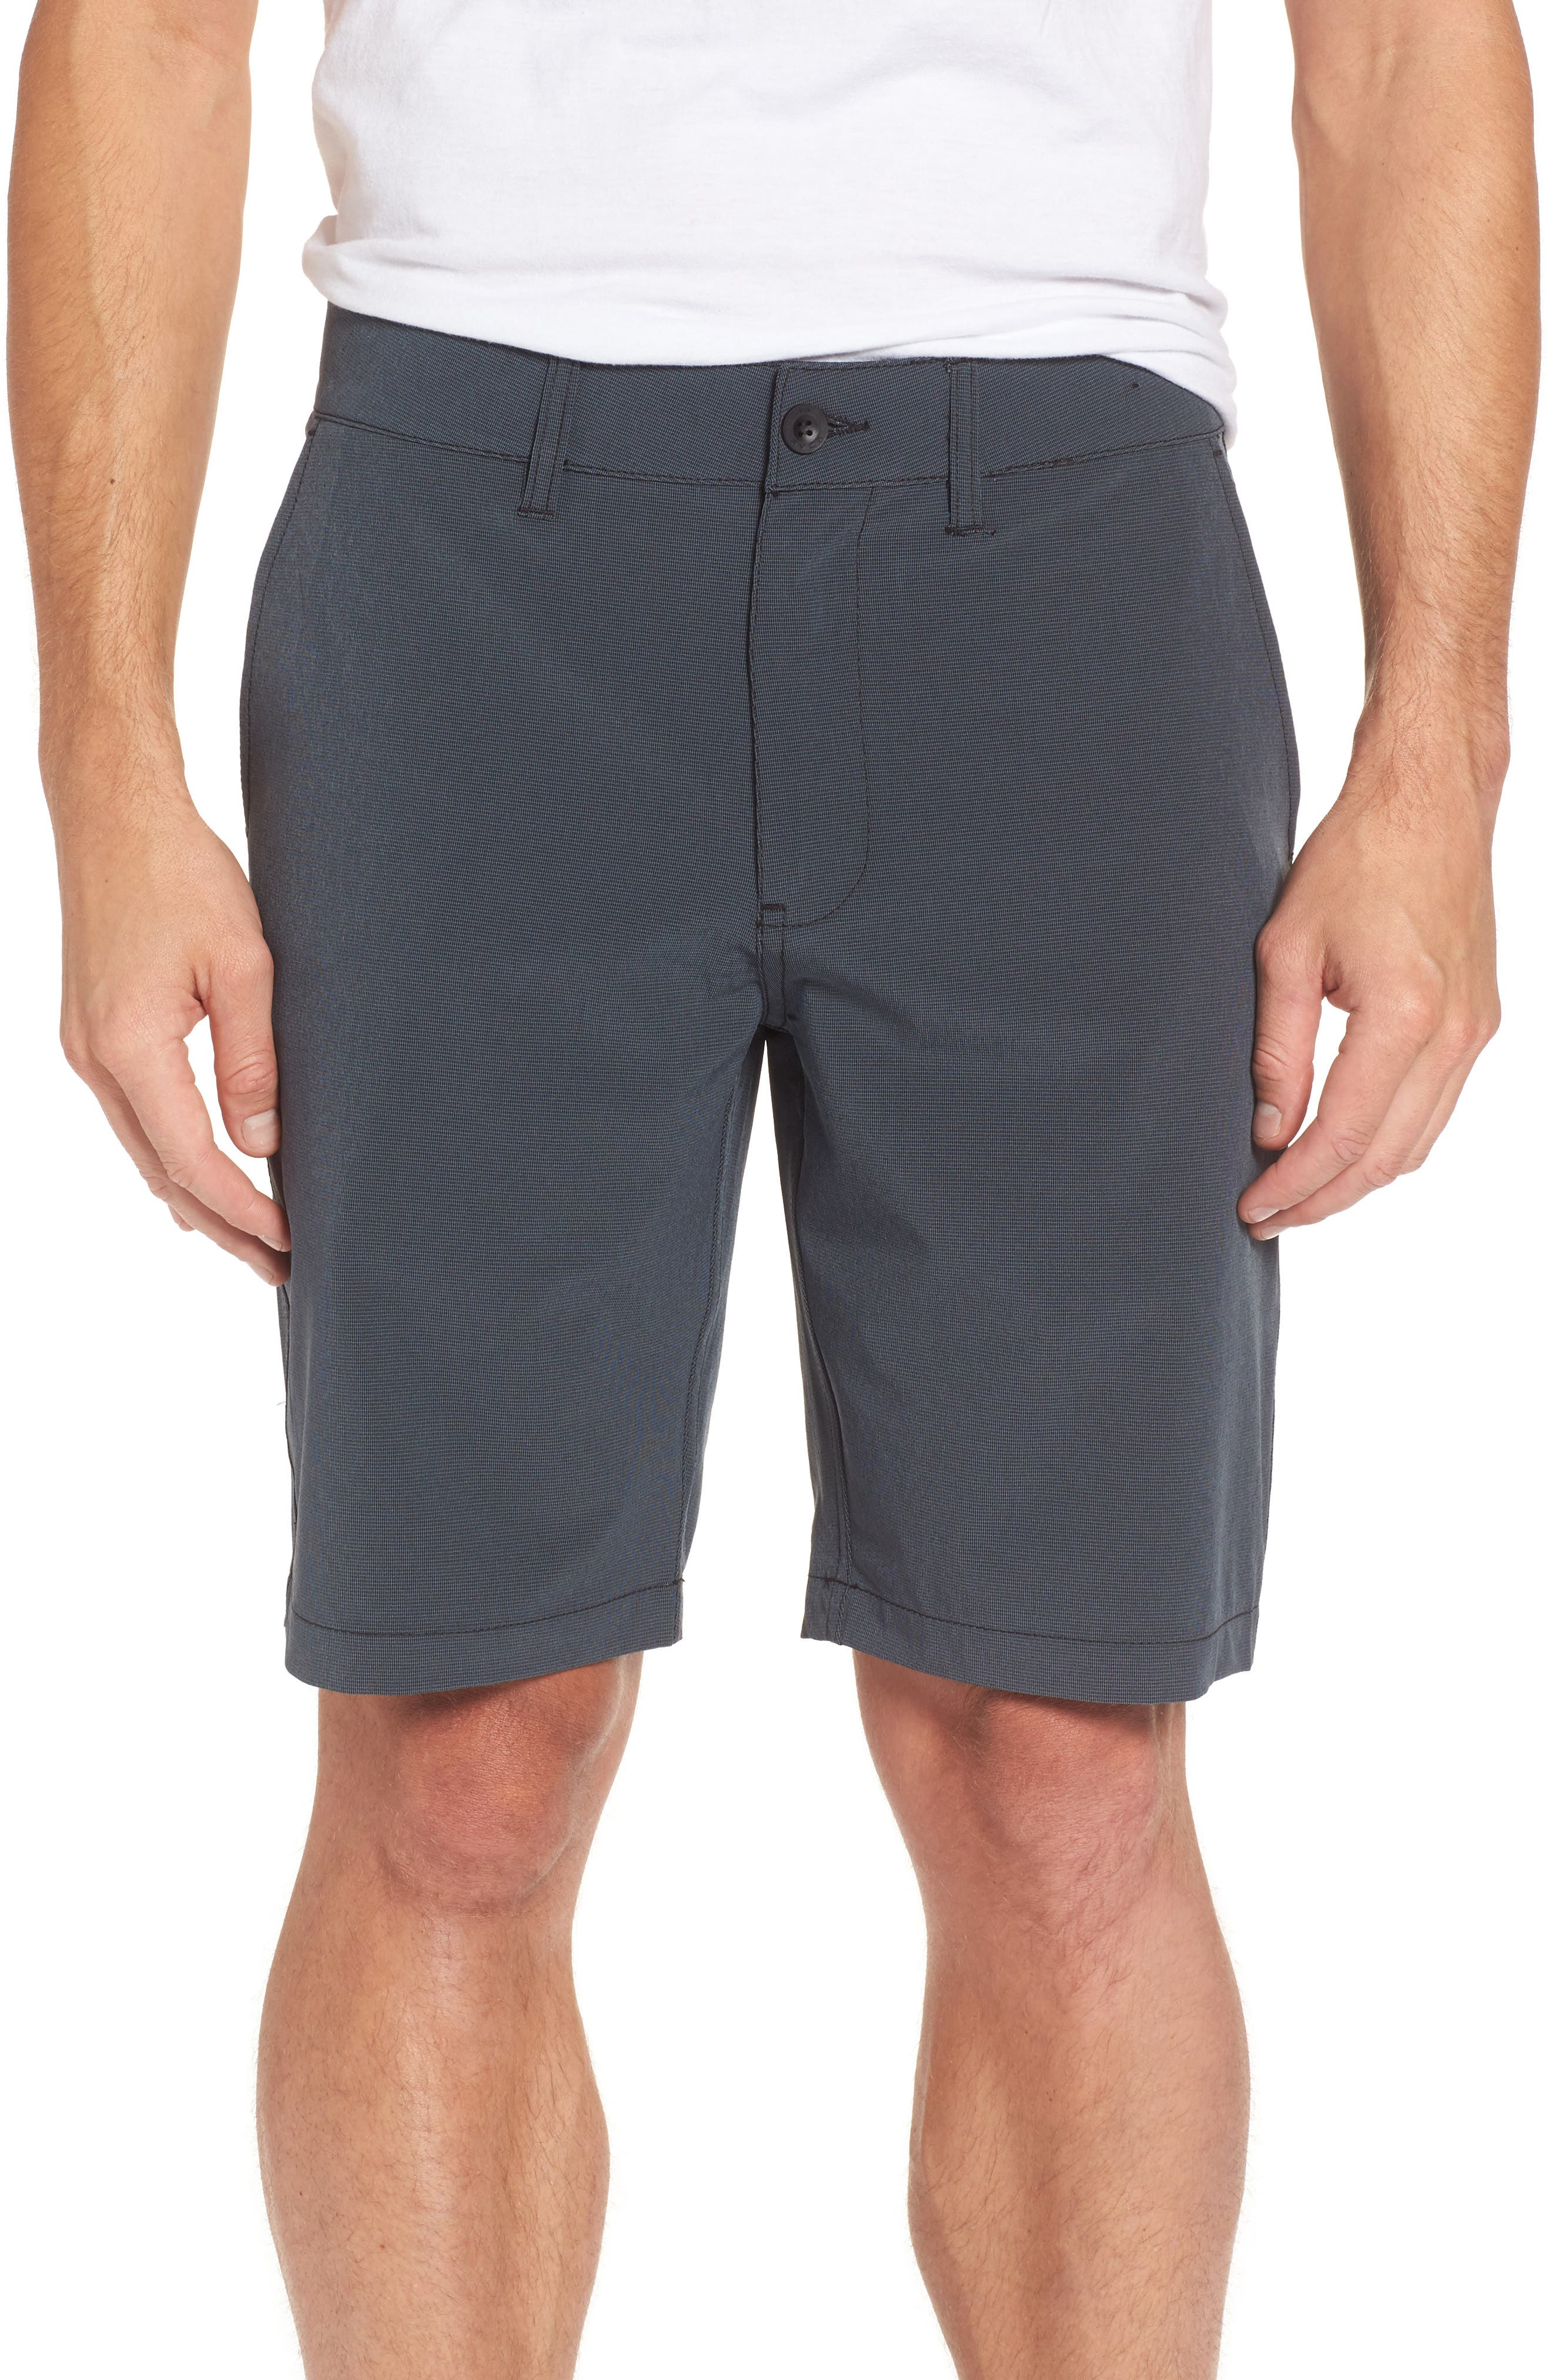 Grid Hybrid Shorts,                             Main thumbnail 1, color,                             001